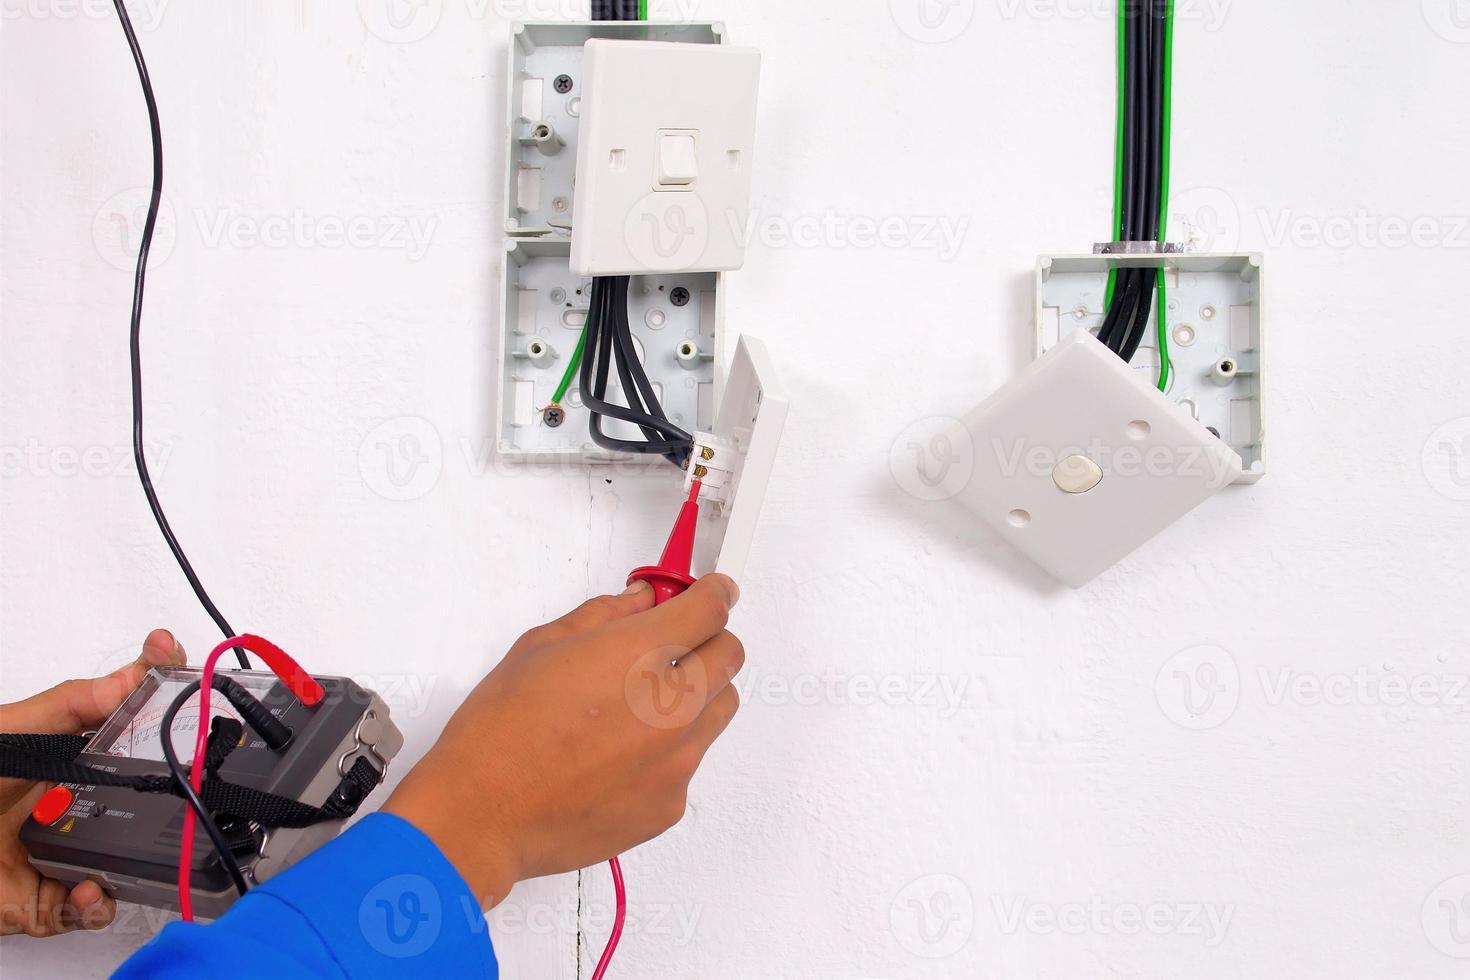 elektricien maken de tests foto